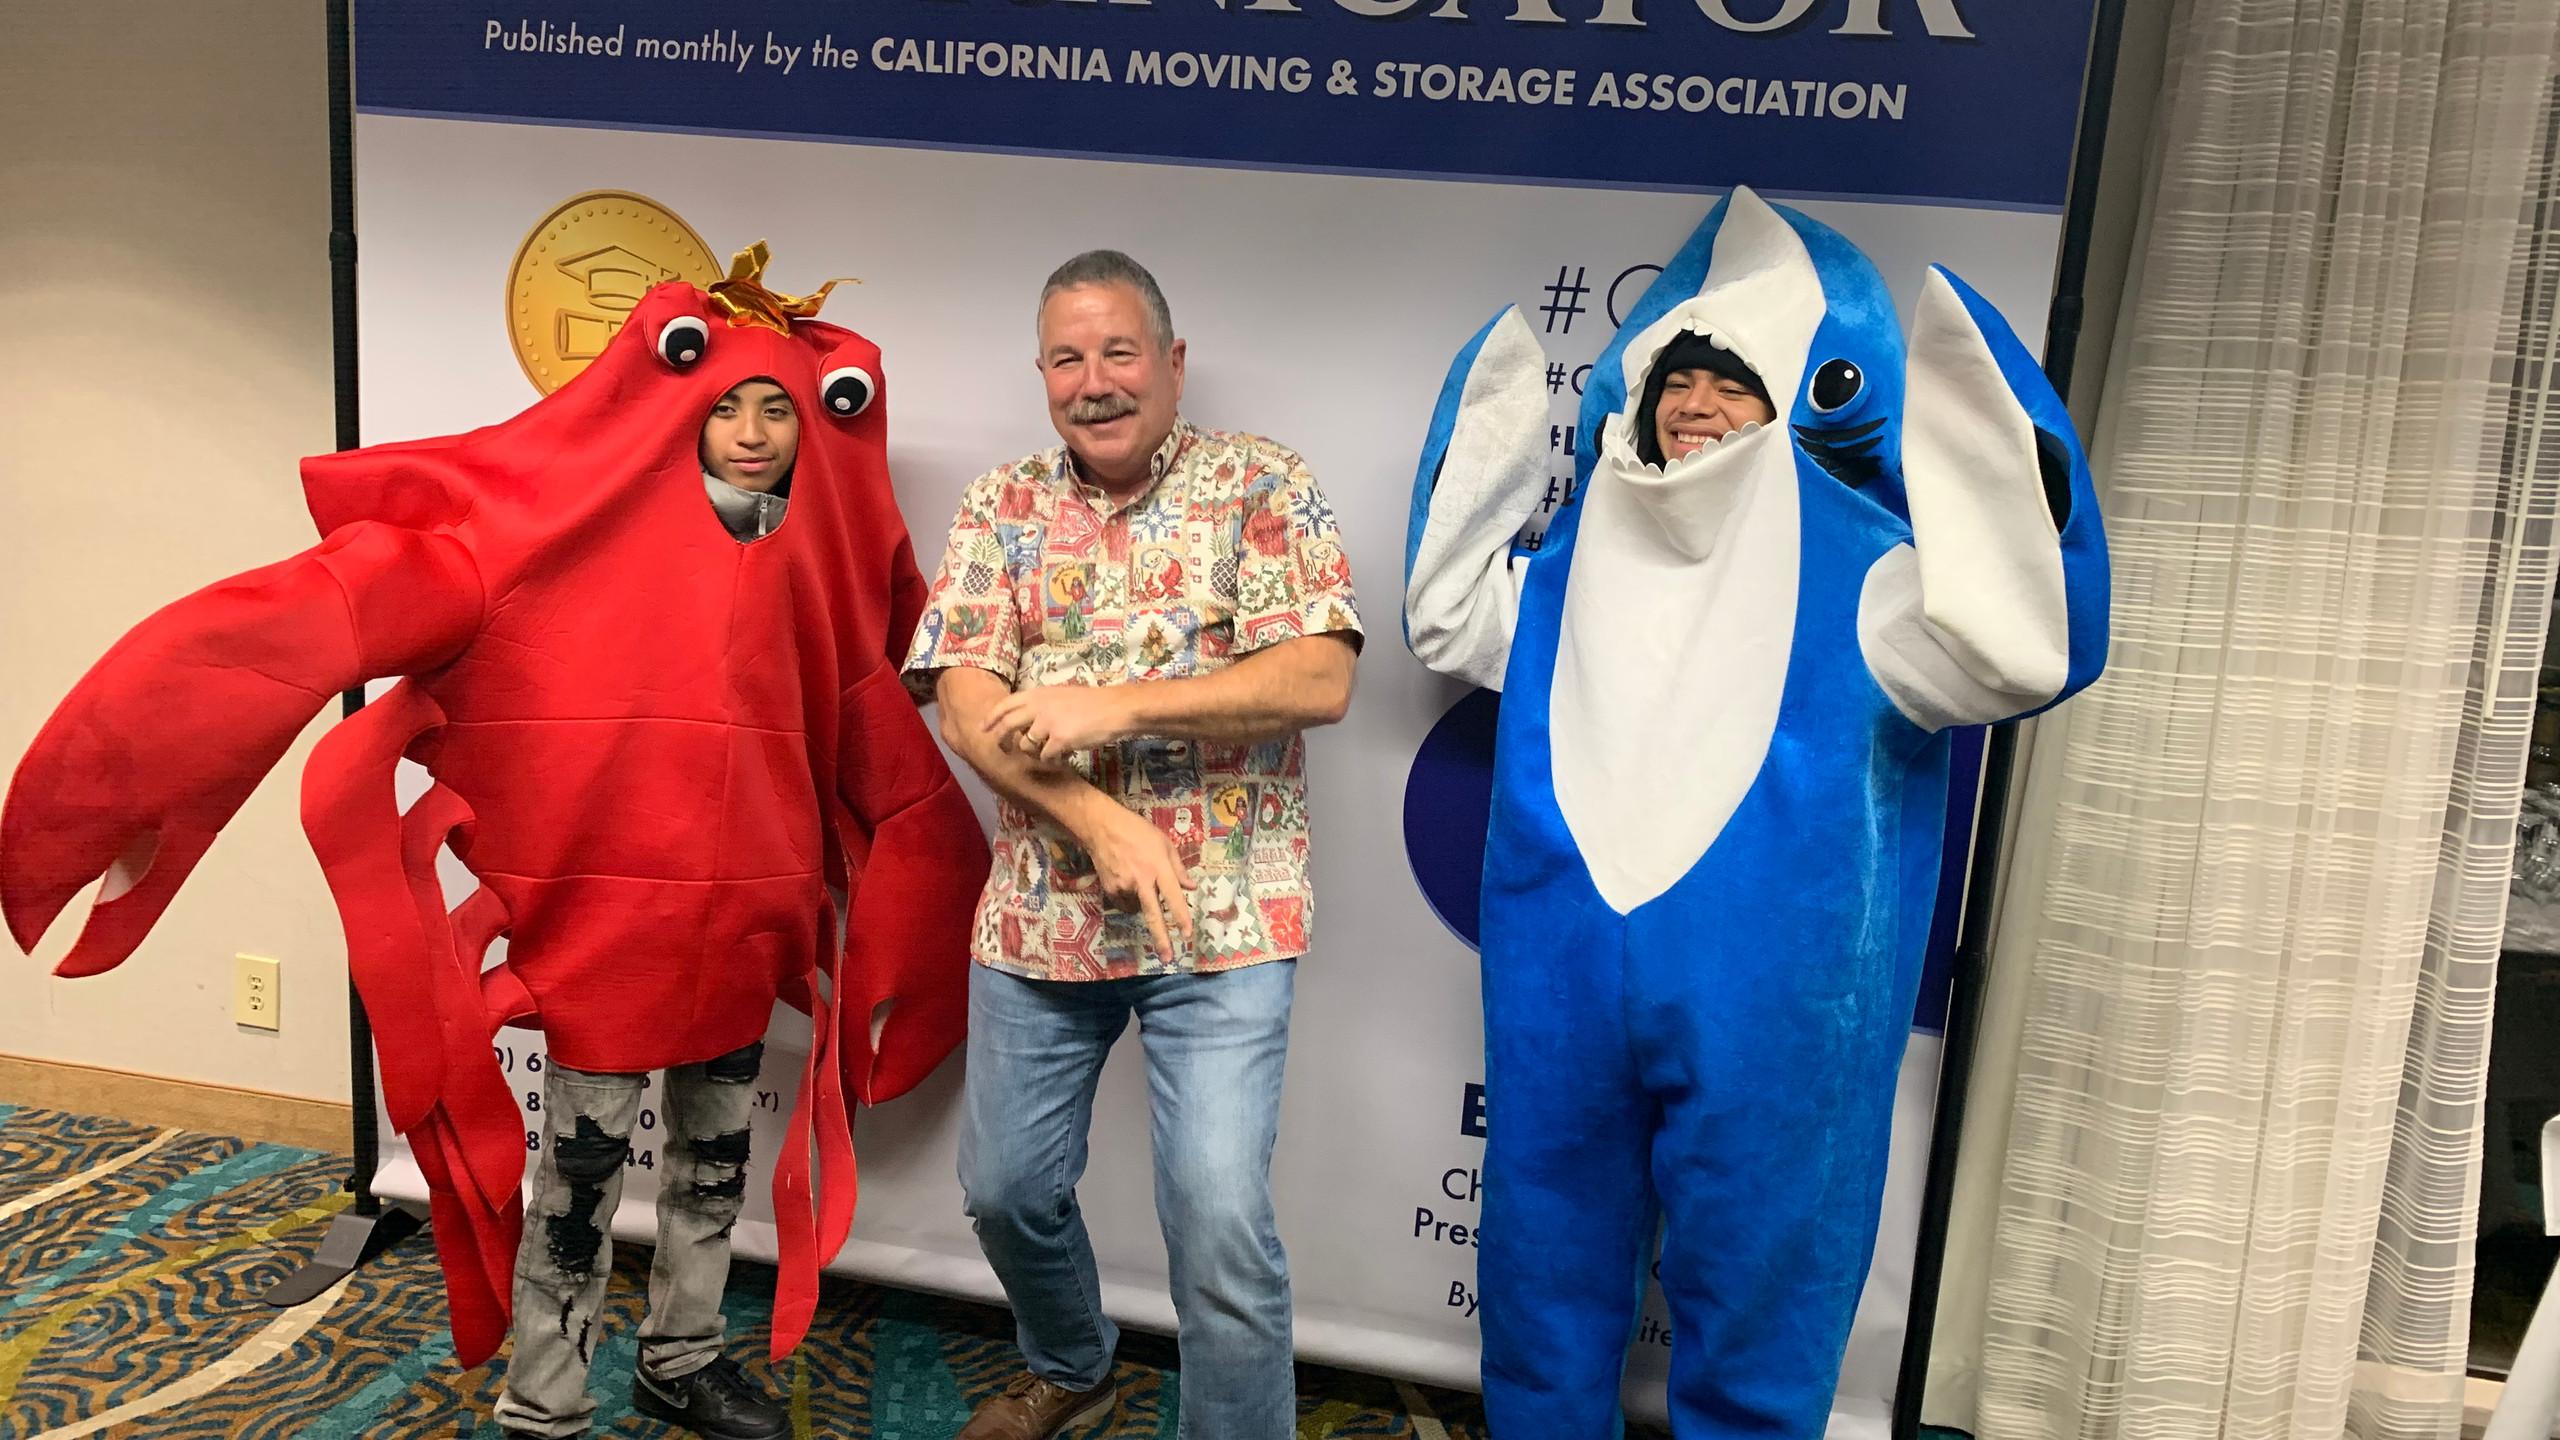 Steve Weitekamp Crab Jr and Baby Shark